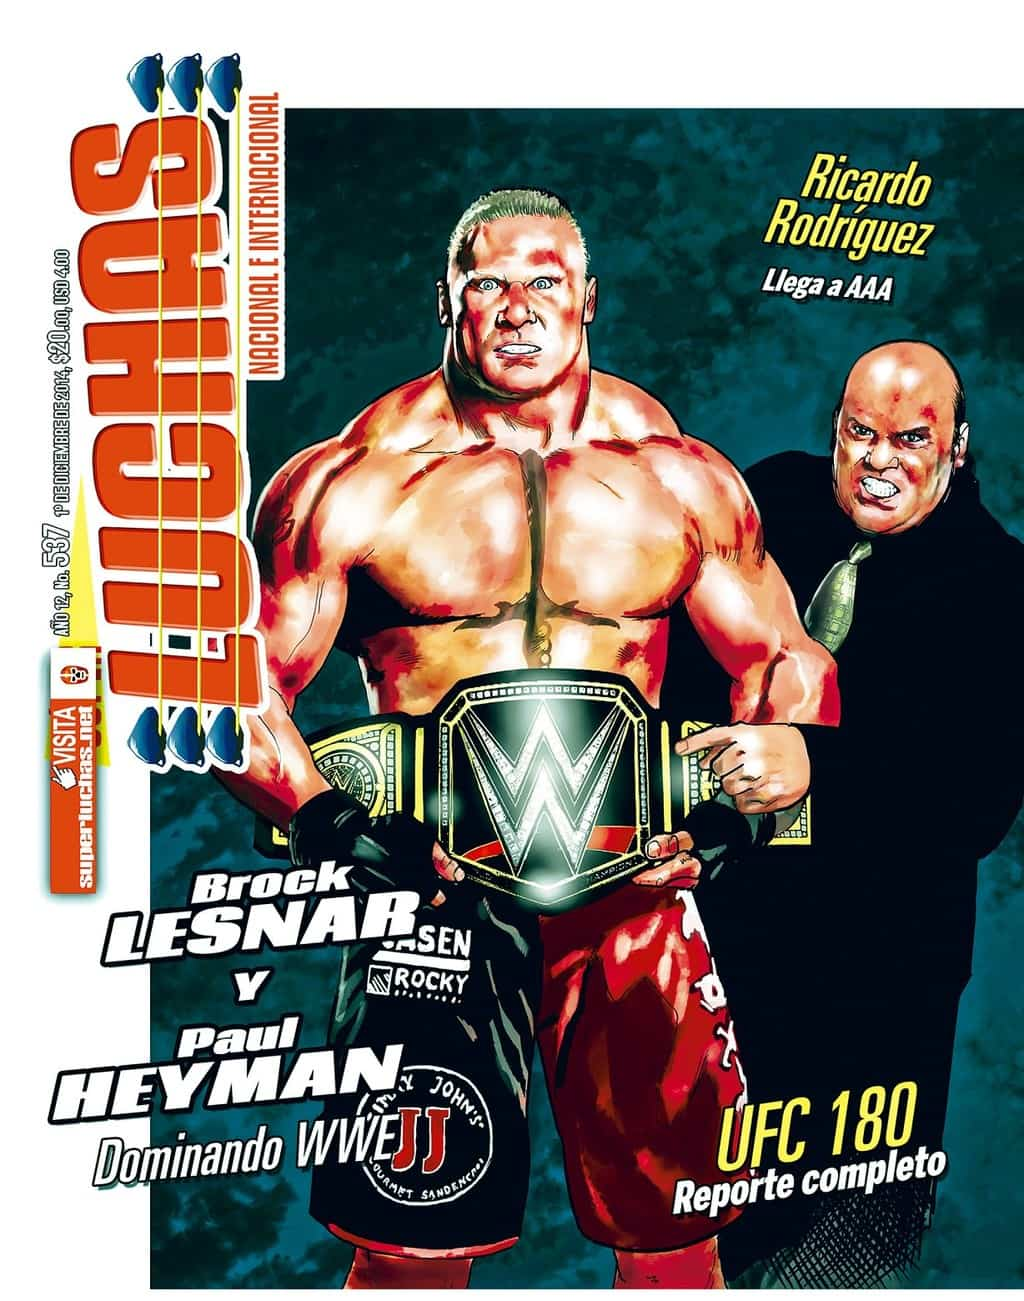 Súper Luchas #537: Brock Lesnar y Paul Heyman, una sociedad fructífera 1